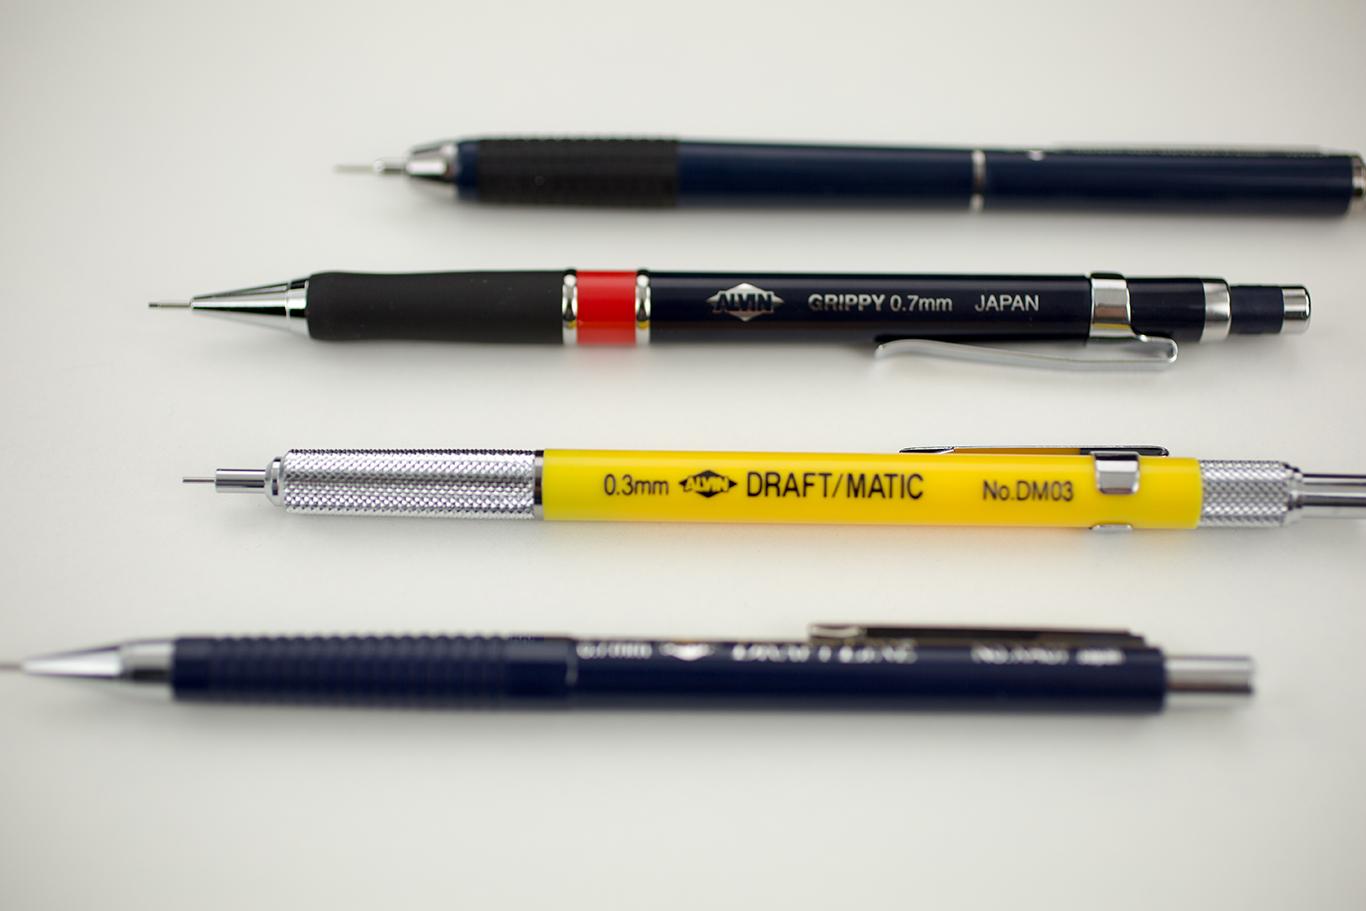 Alvin® Mechancial Pencils: Draf-Tec Retrac Item No. DR05, Grippy .7mm Item No. AGR7, Draft-Matic .3mm Item No. DM03, & Draft-Line Item No. XA05